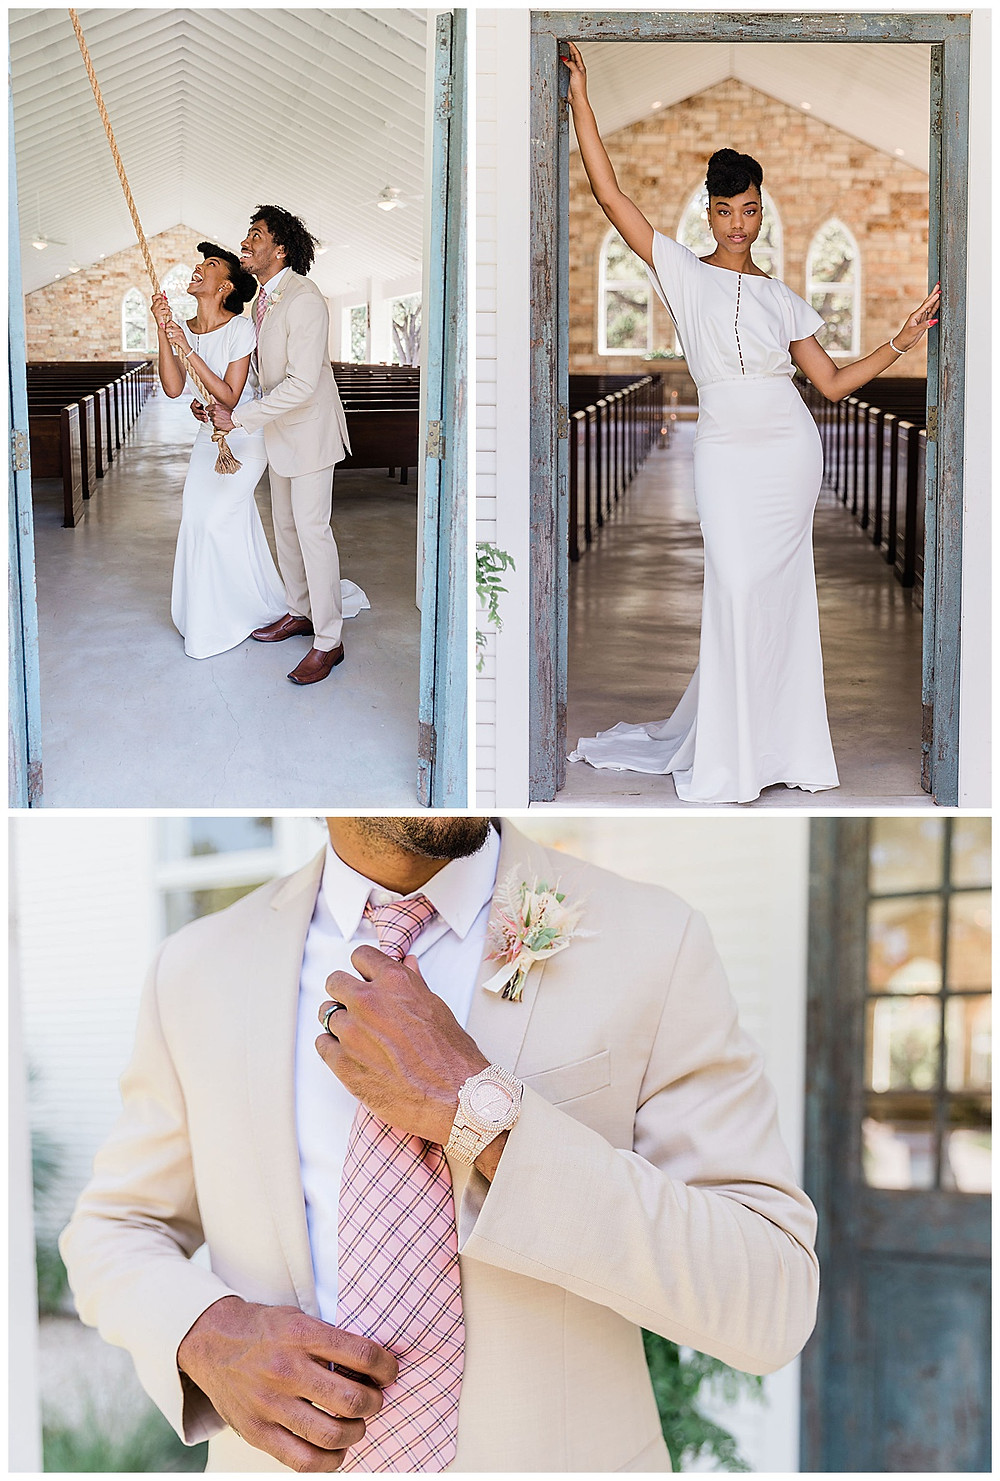 wedding chapel. mission bell. wedding ceremony. bride and groom. modern boho wedding. luxury wedding planner.